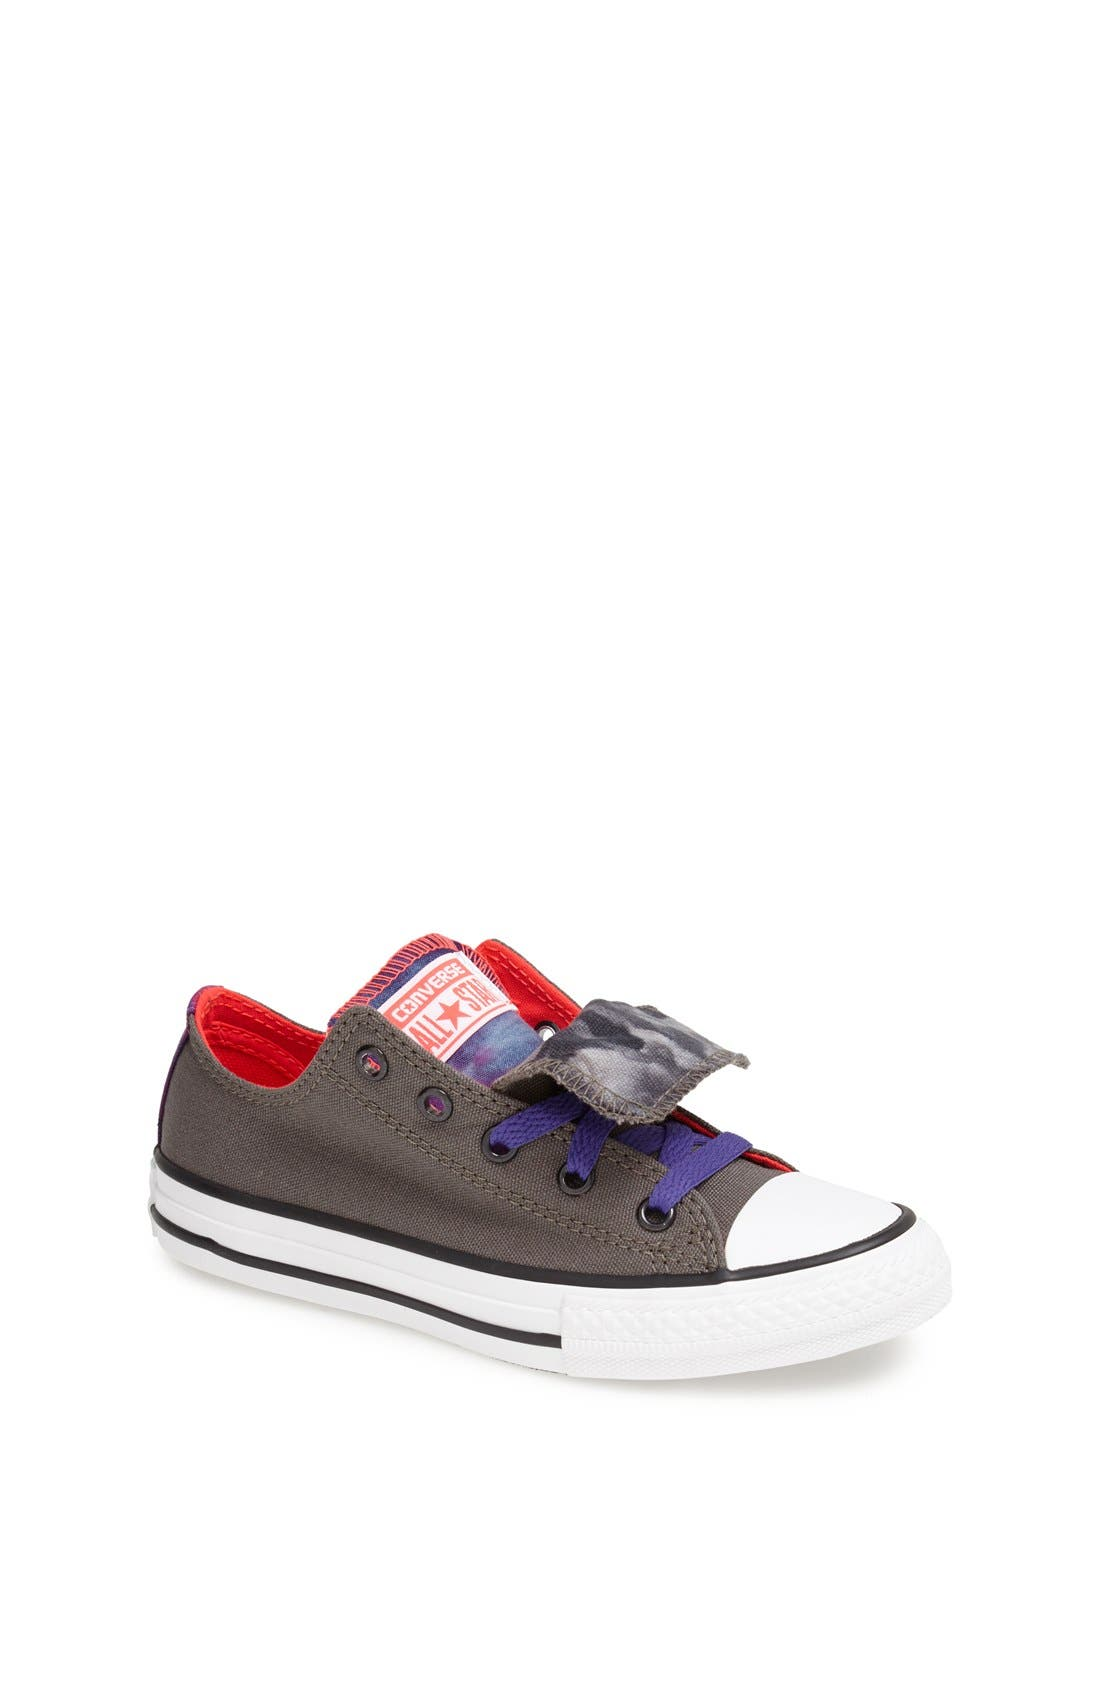 Main Image - Converse Chuck Taylor® Double Zip Sneaker (Toddler, Little Kid & Big Kid)